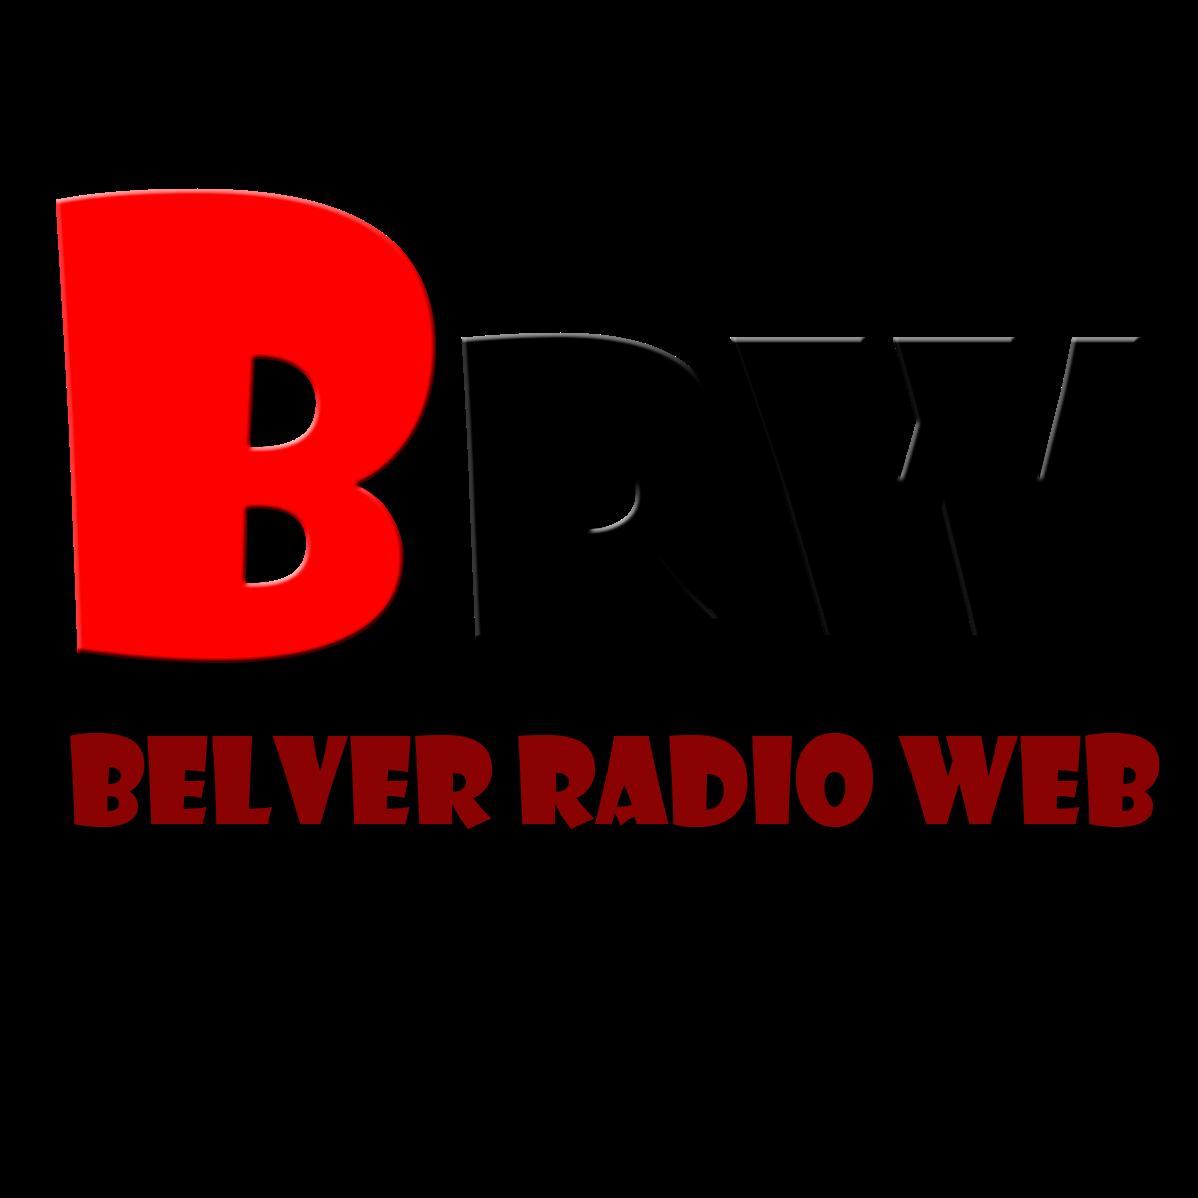 Belver RadioWeb